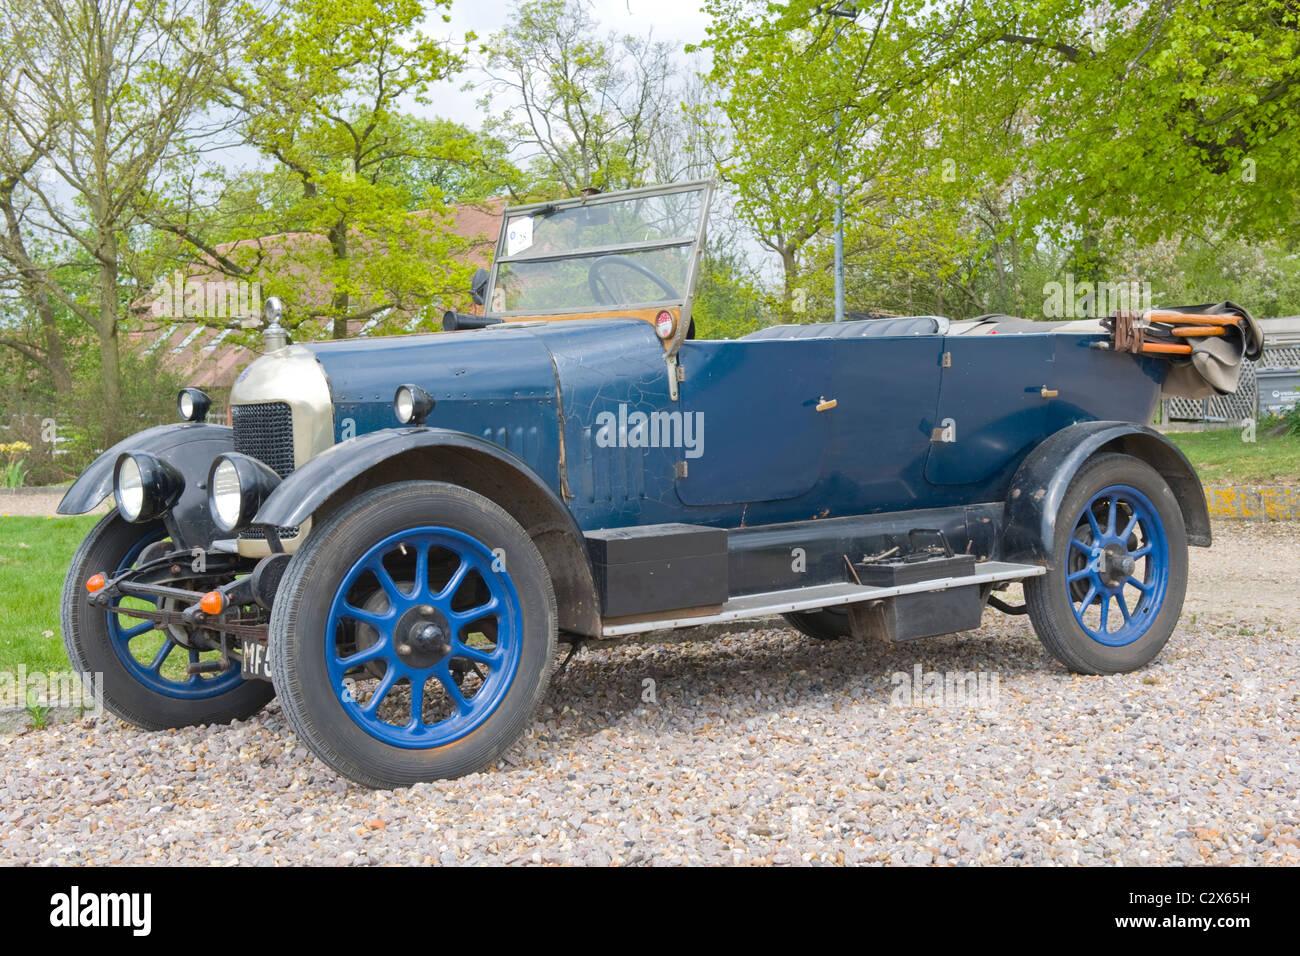 de Havilland Aircraft Heritage Centre Museum , Morris Cars Day , 1924 4dr Morris Bullnose 1.5l Hotchkiss straight - Stock Image